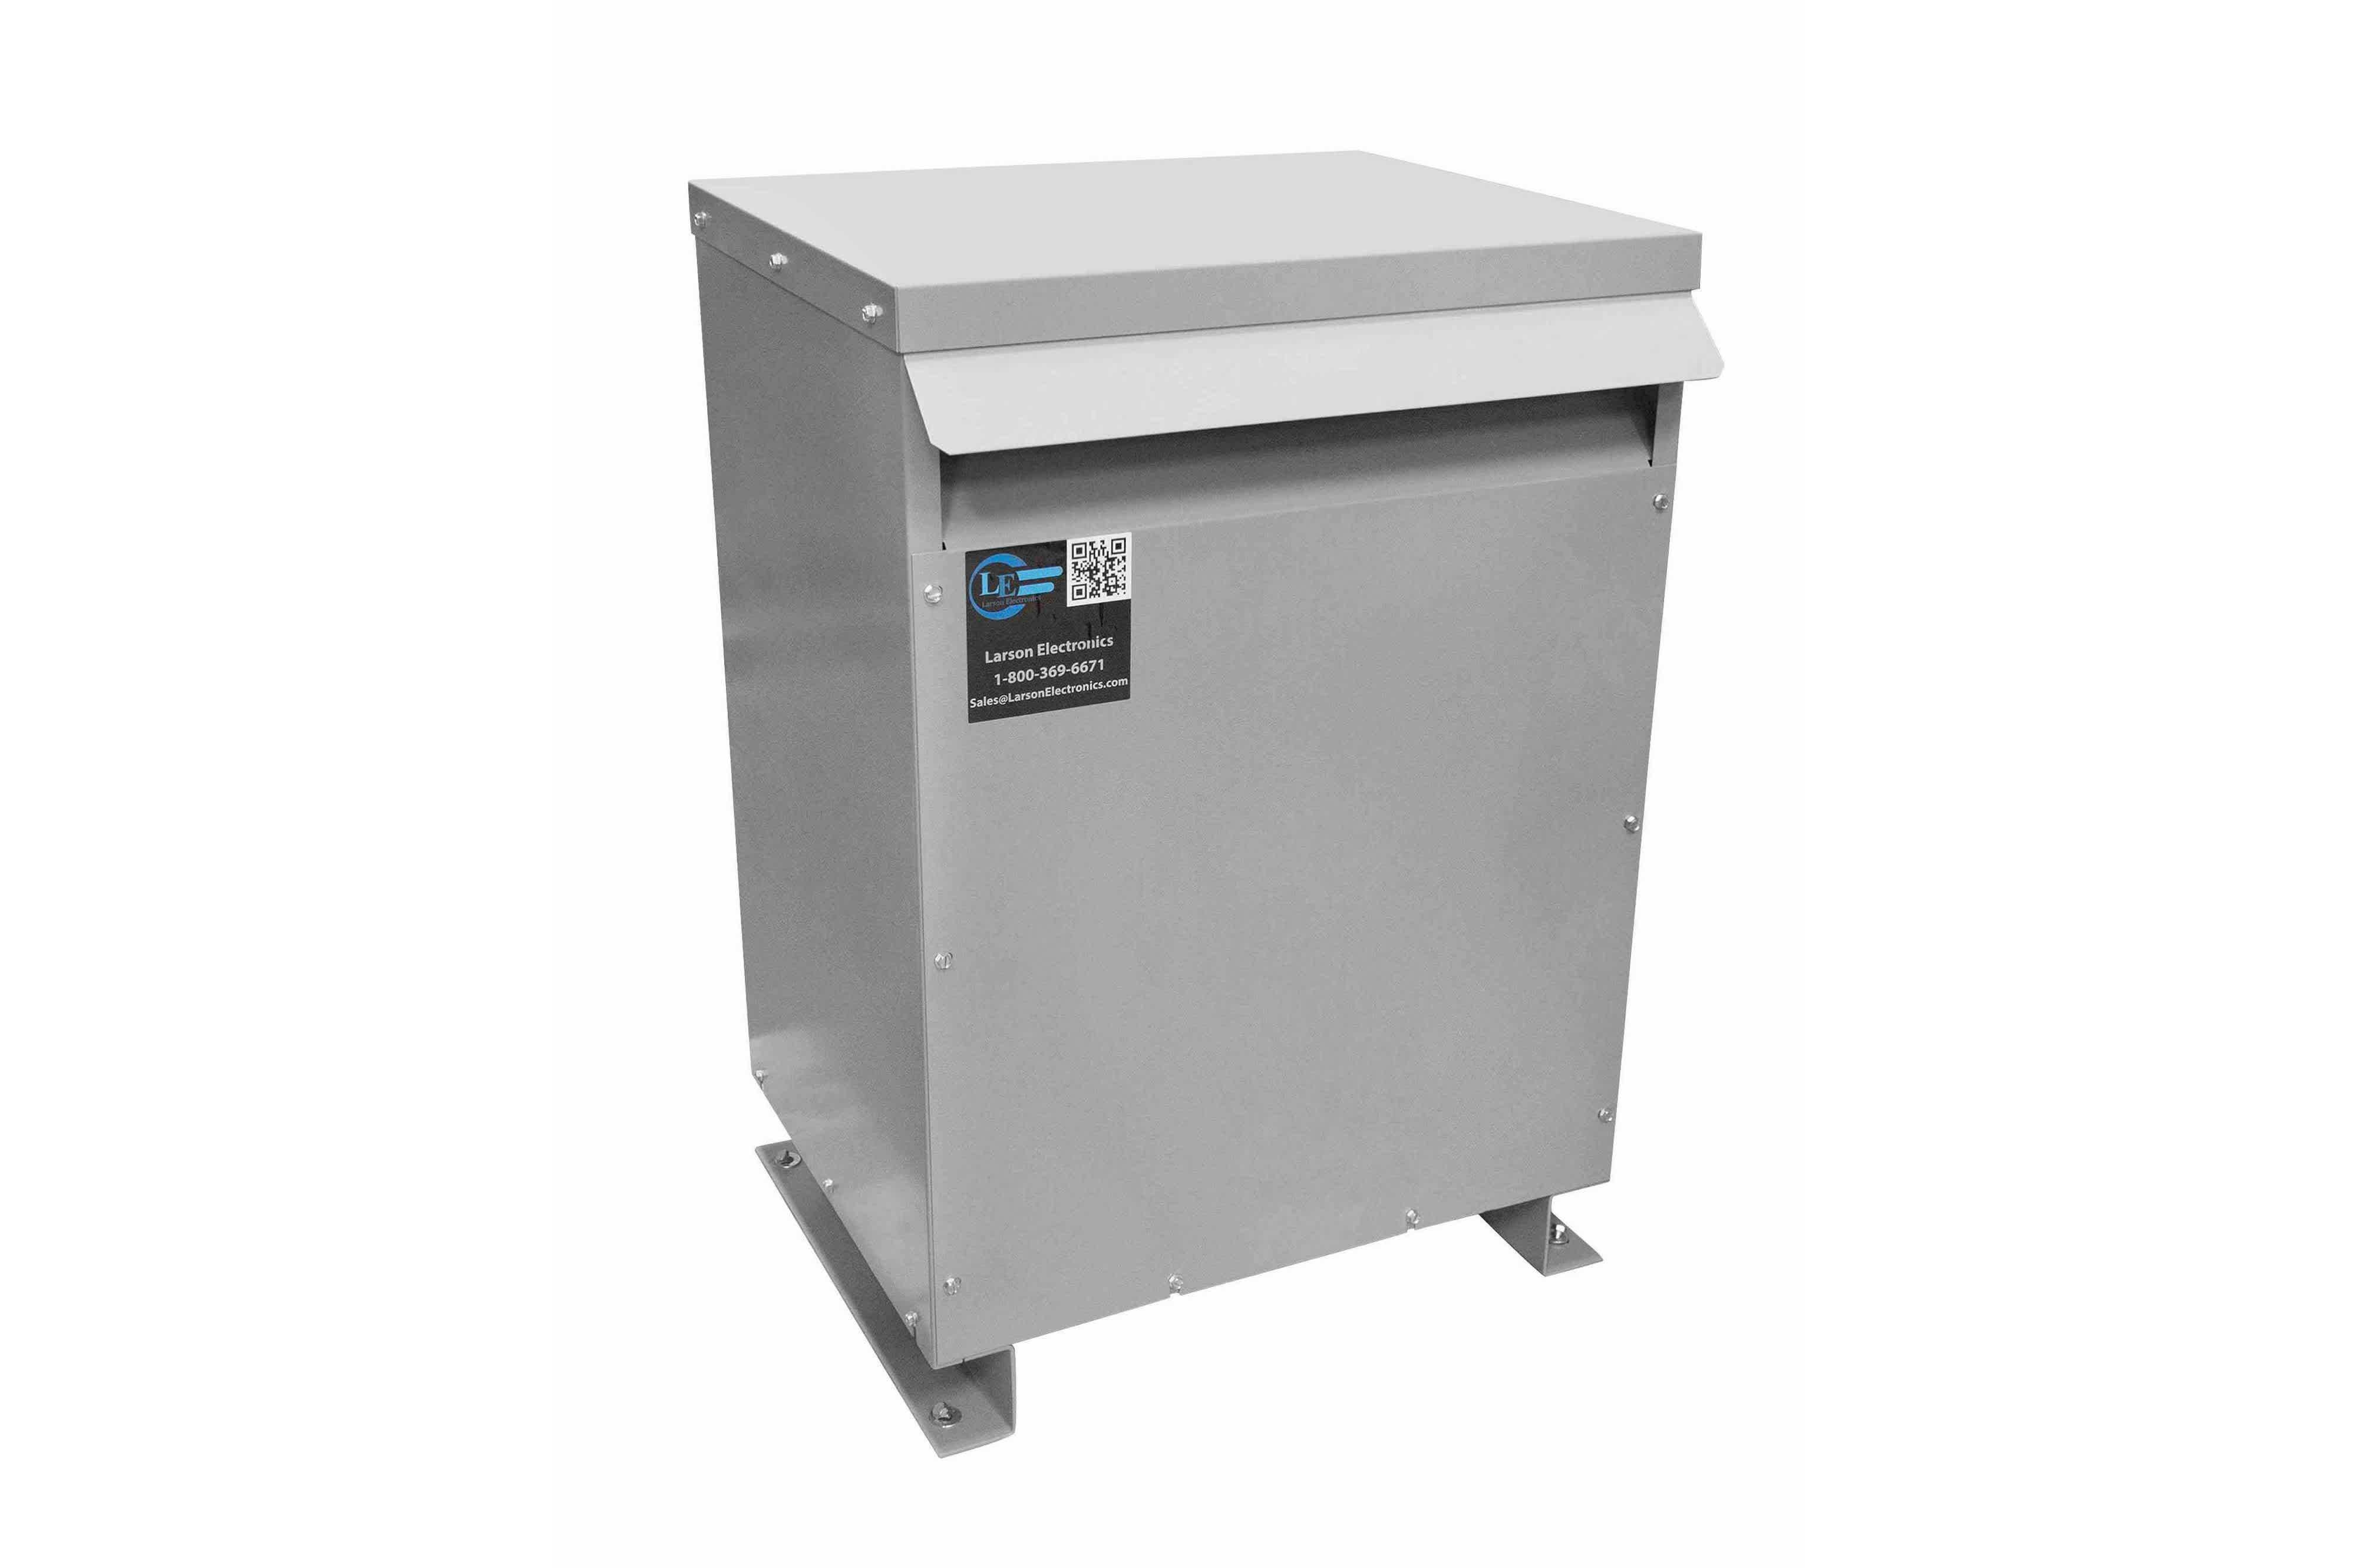 50 kVA 3PH Isolation Transformer, 230V Wye Primary, 208V Delta Secondary, N3R, Ventilated, 60 Hz